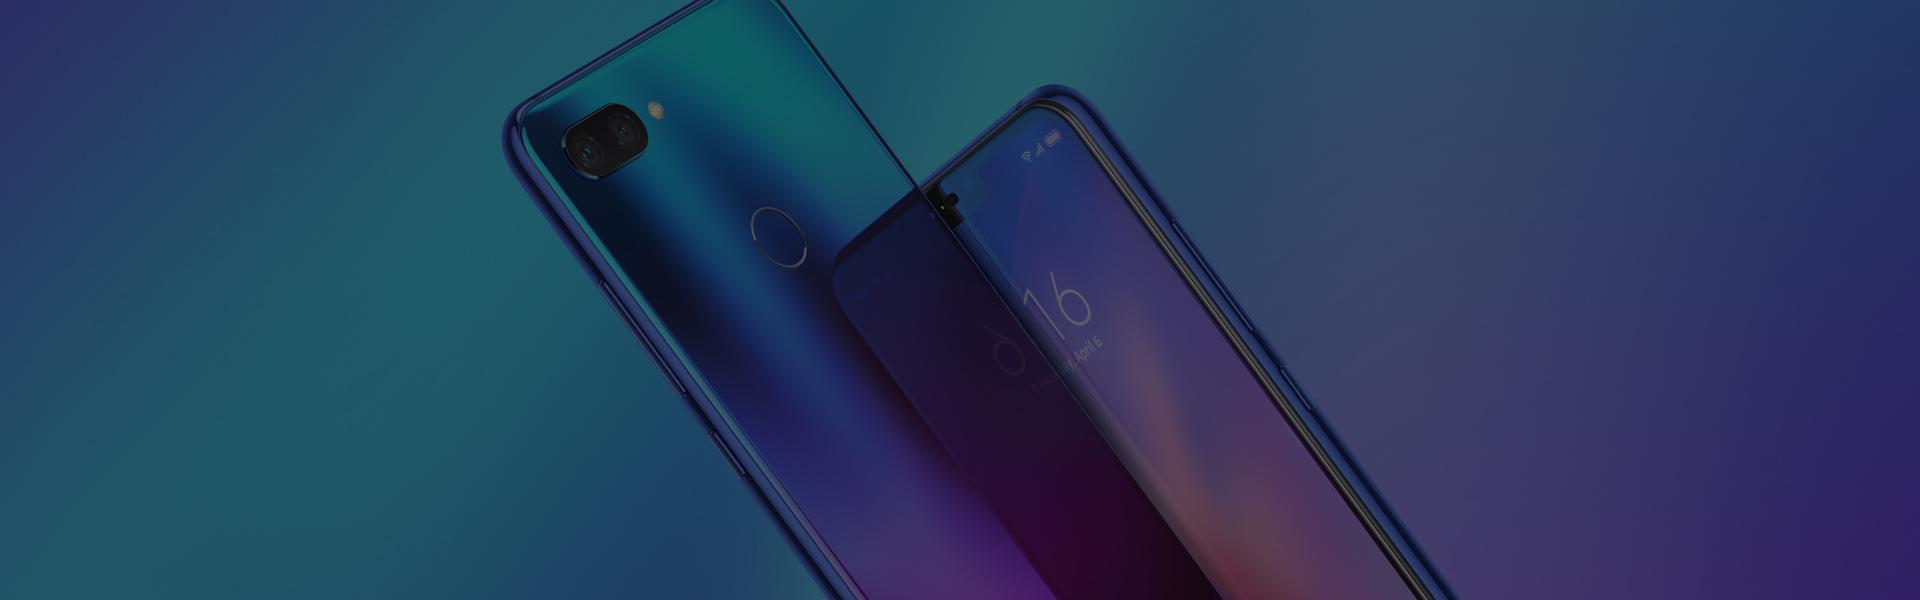 Recensione Xiaomi Mi 8 Lite, il Best Buy elegante